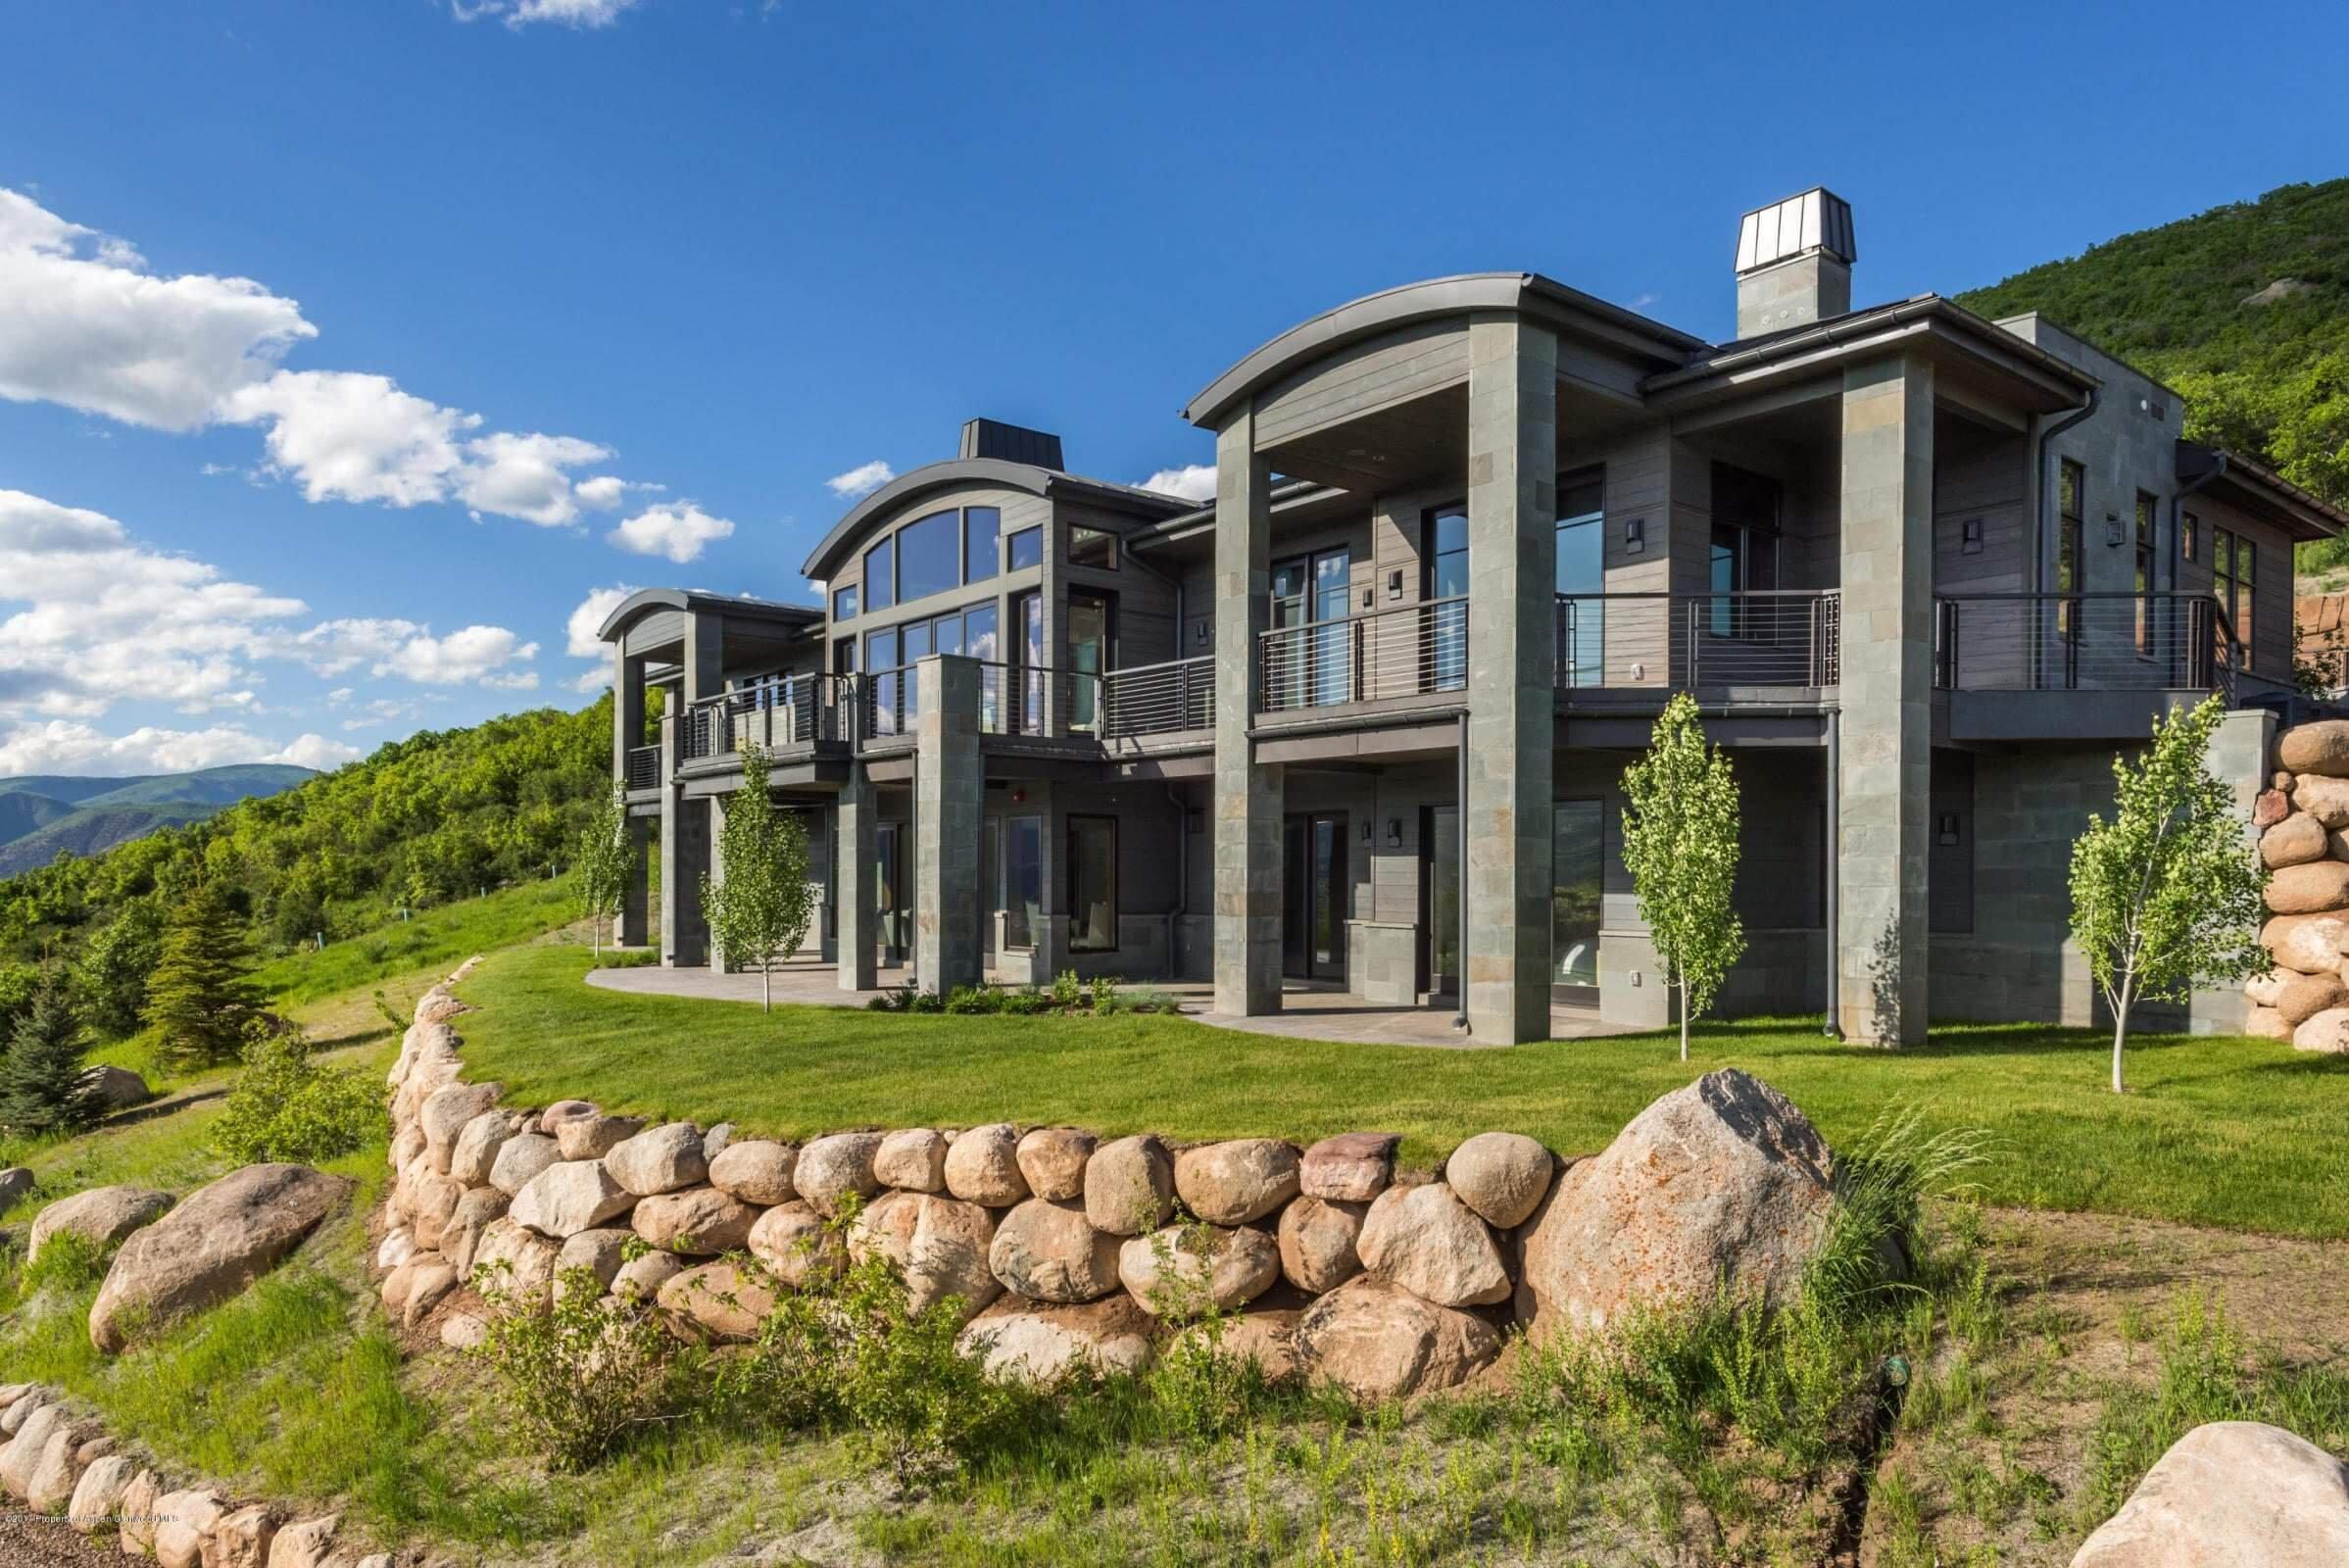 2015 Built McLain Flats Home Sells at $9M/$1,189 sq ft Furnished Image